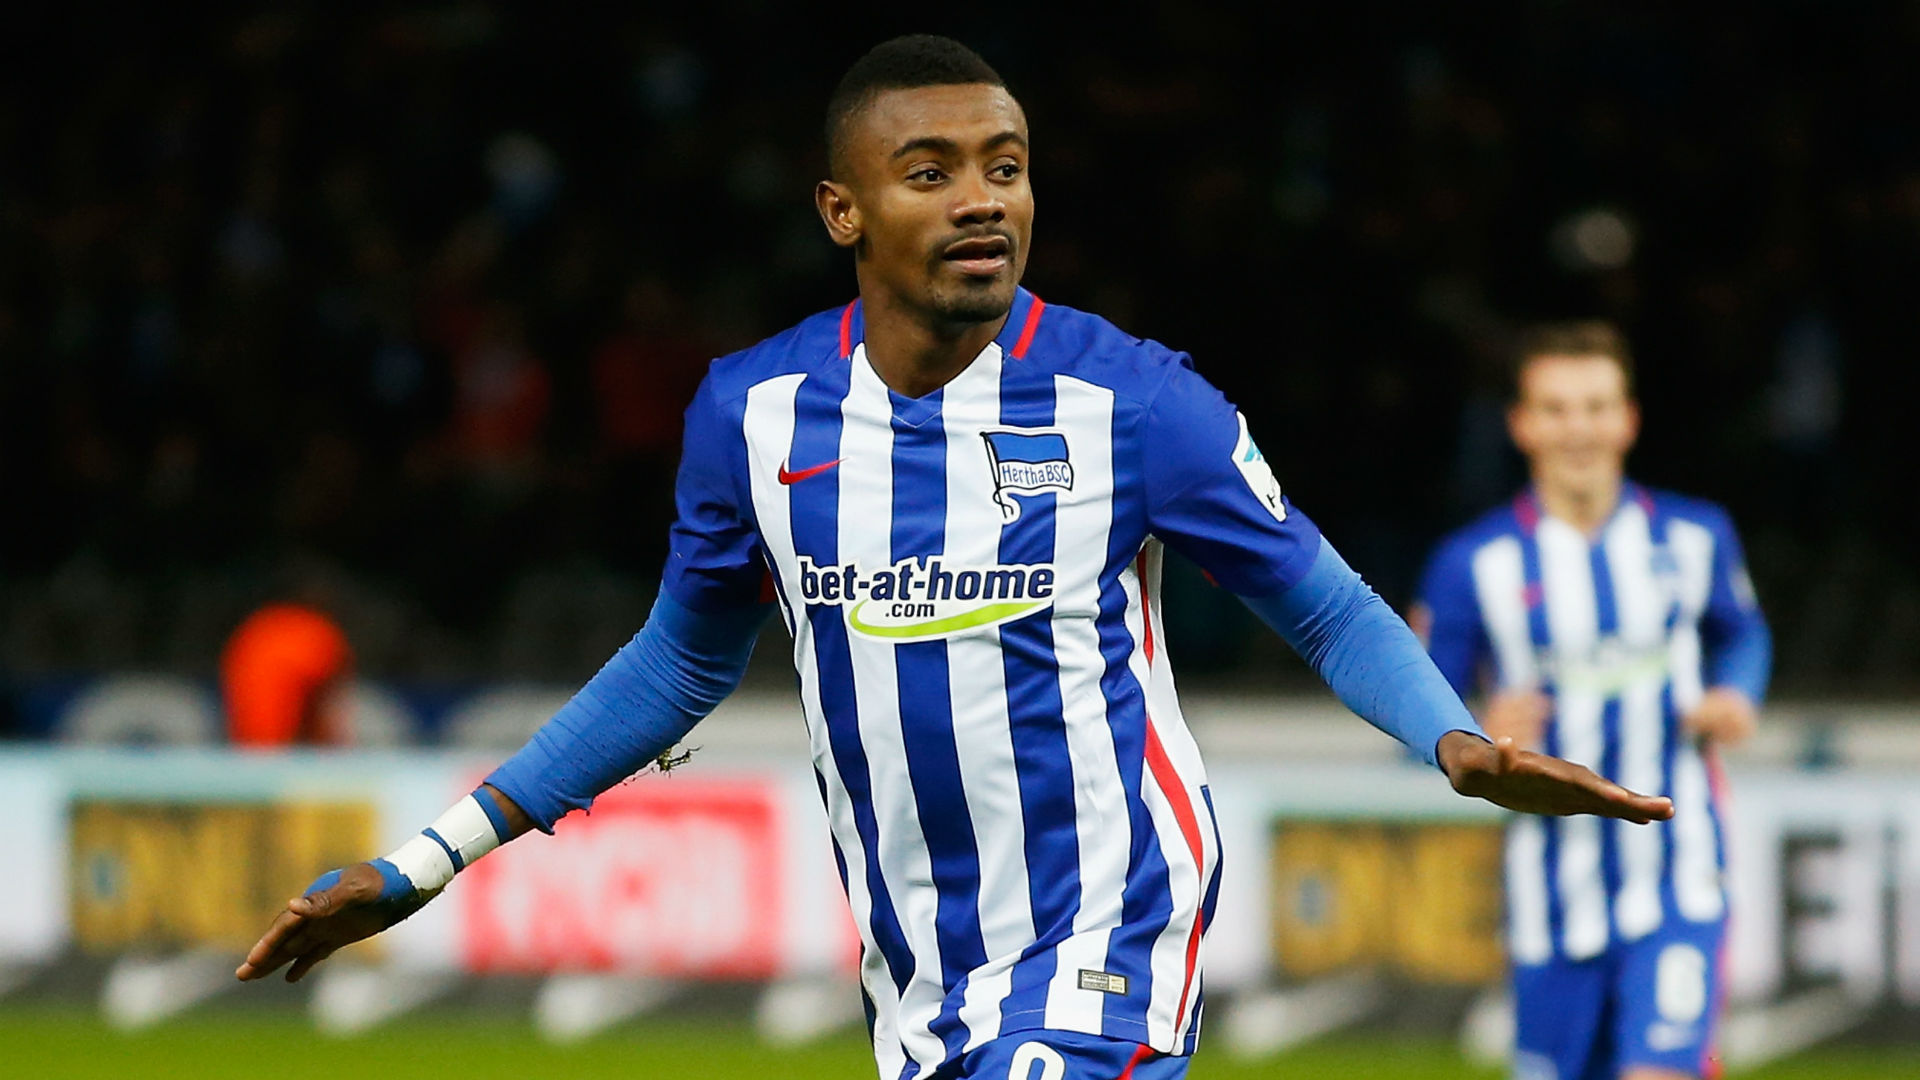 Salomon Kalou rescues Hertha Berlin vs. Hoffenheim | Goal.com